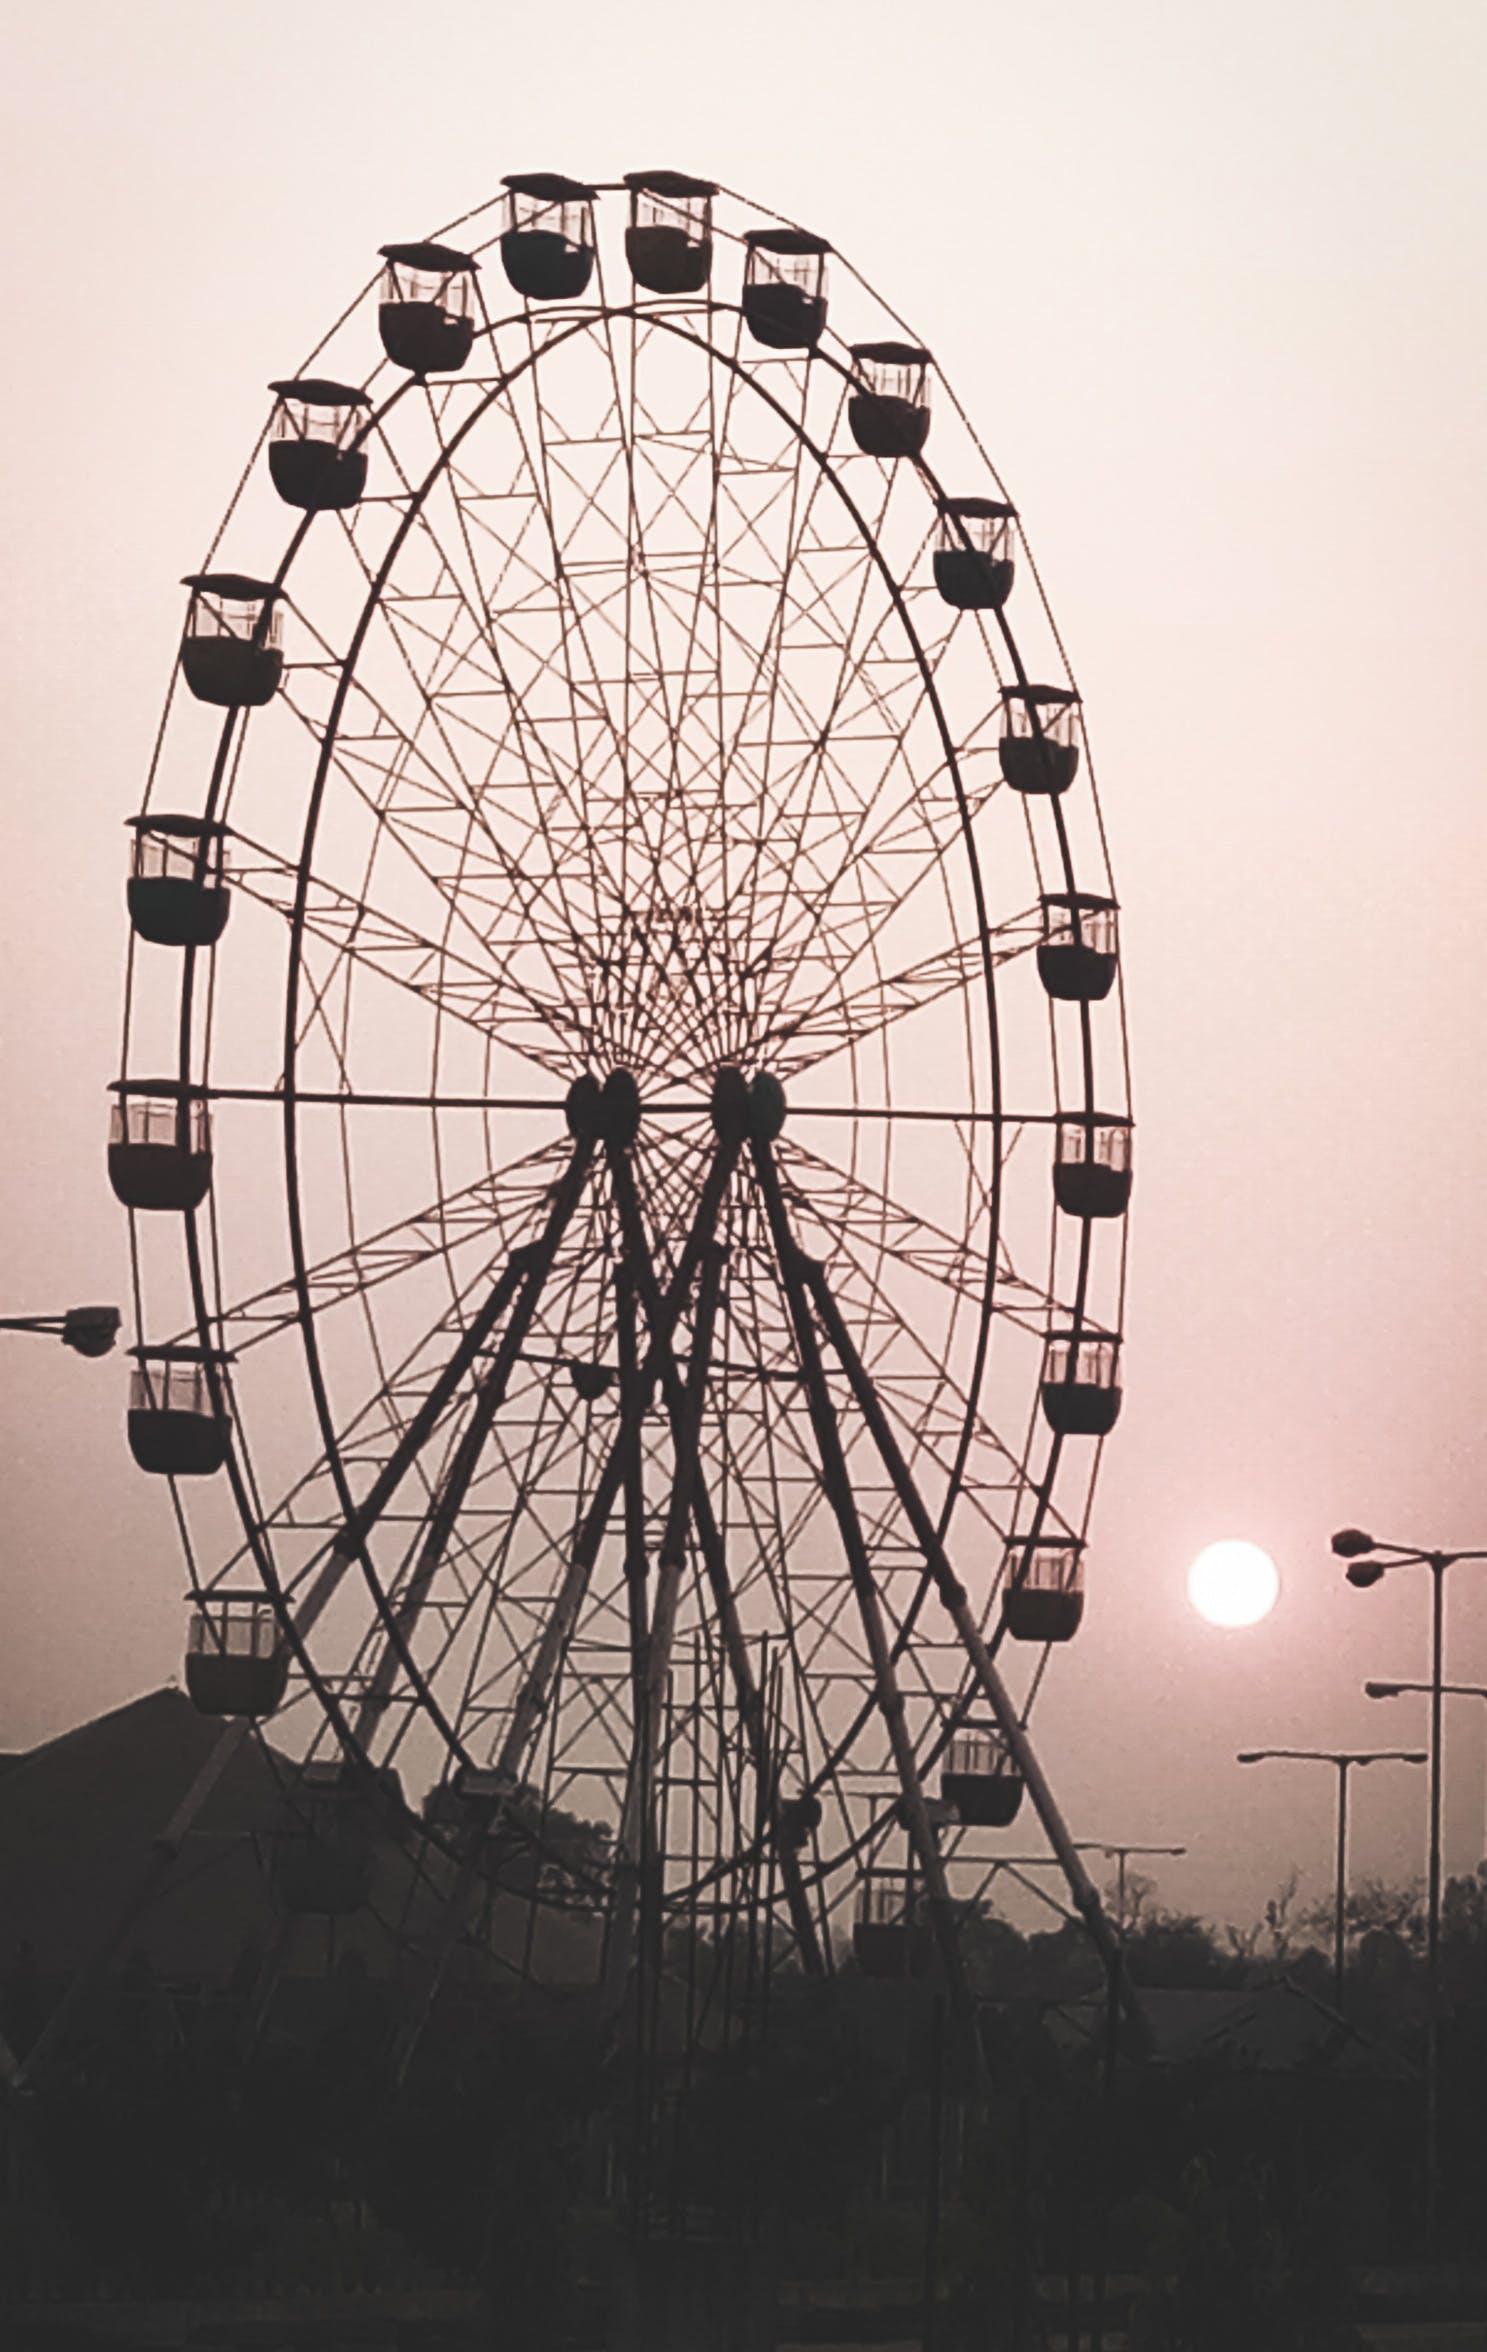 Free stock photo of #gaintwheel #sunset #